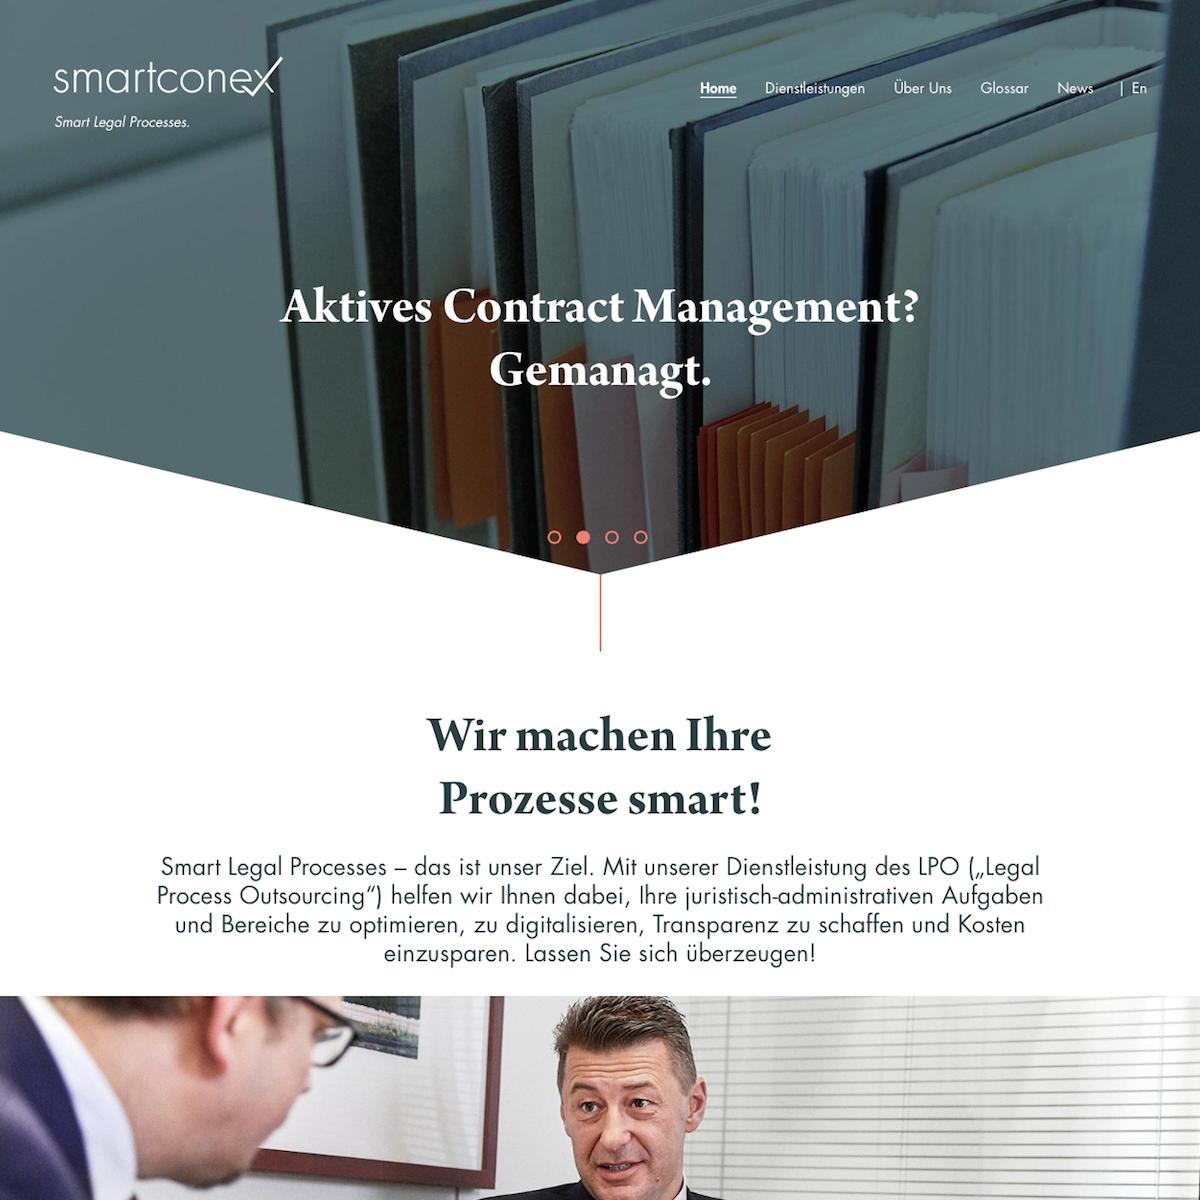 smartconex